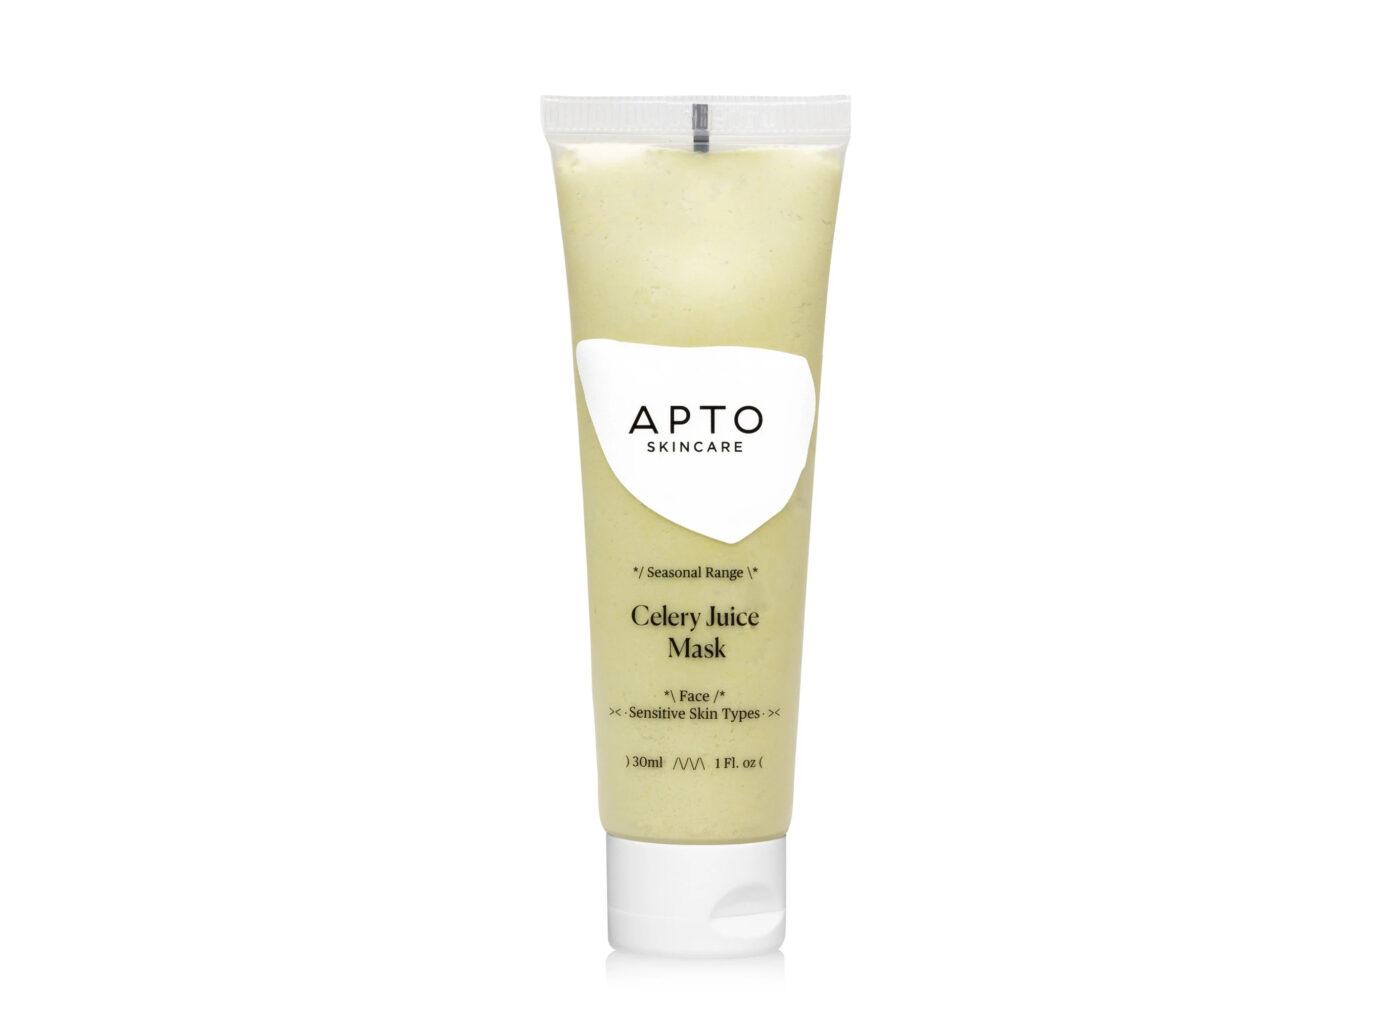 APTO Skincare Celery Juice Mask